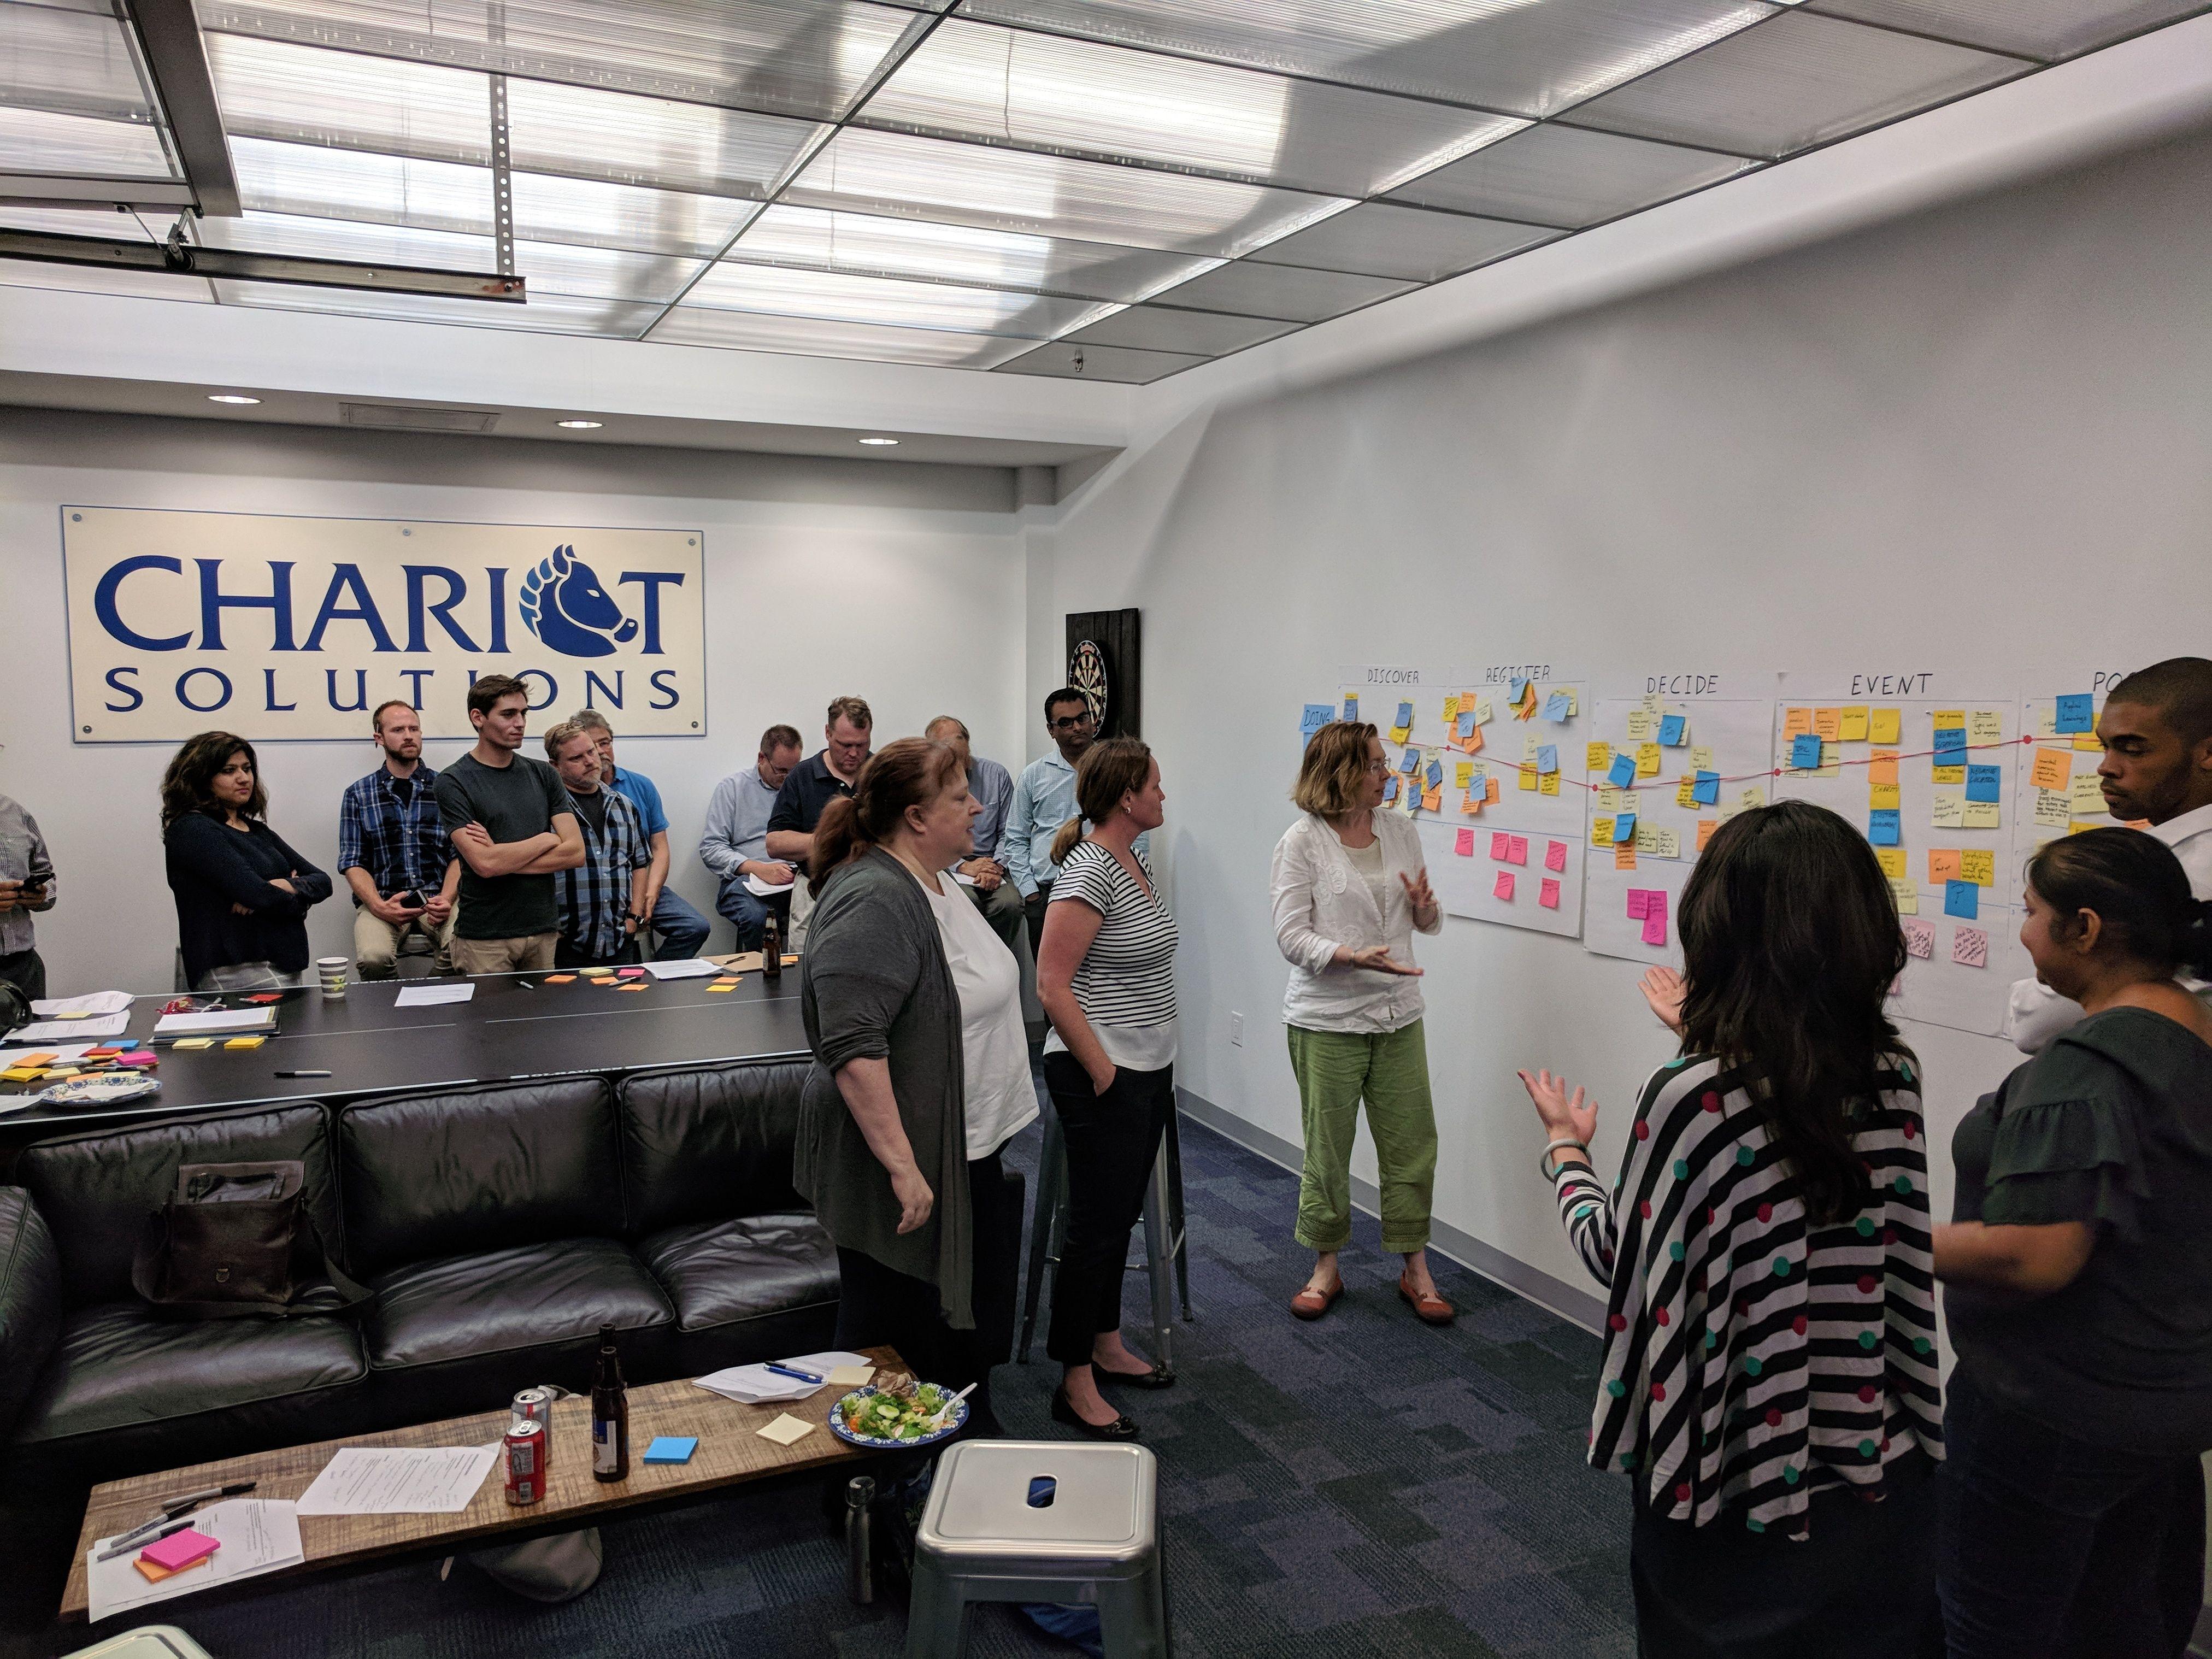 ProductTank Philadelphia